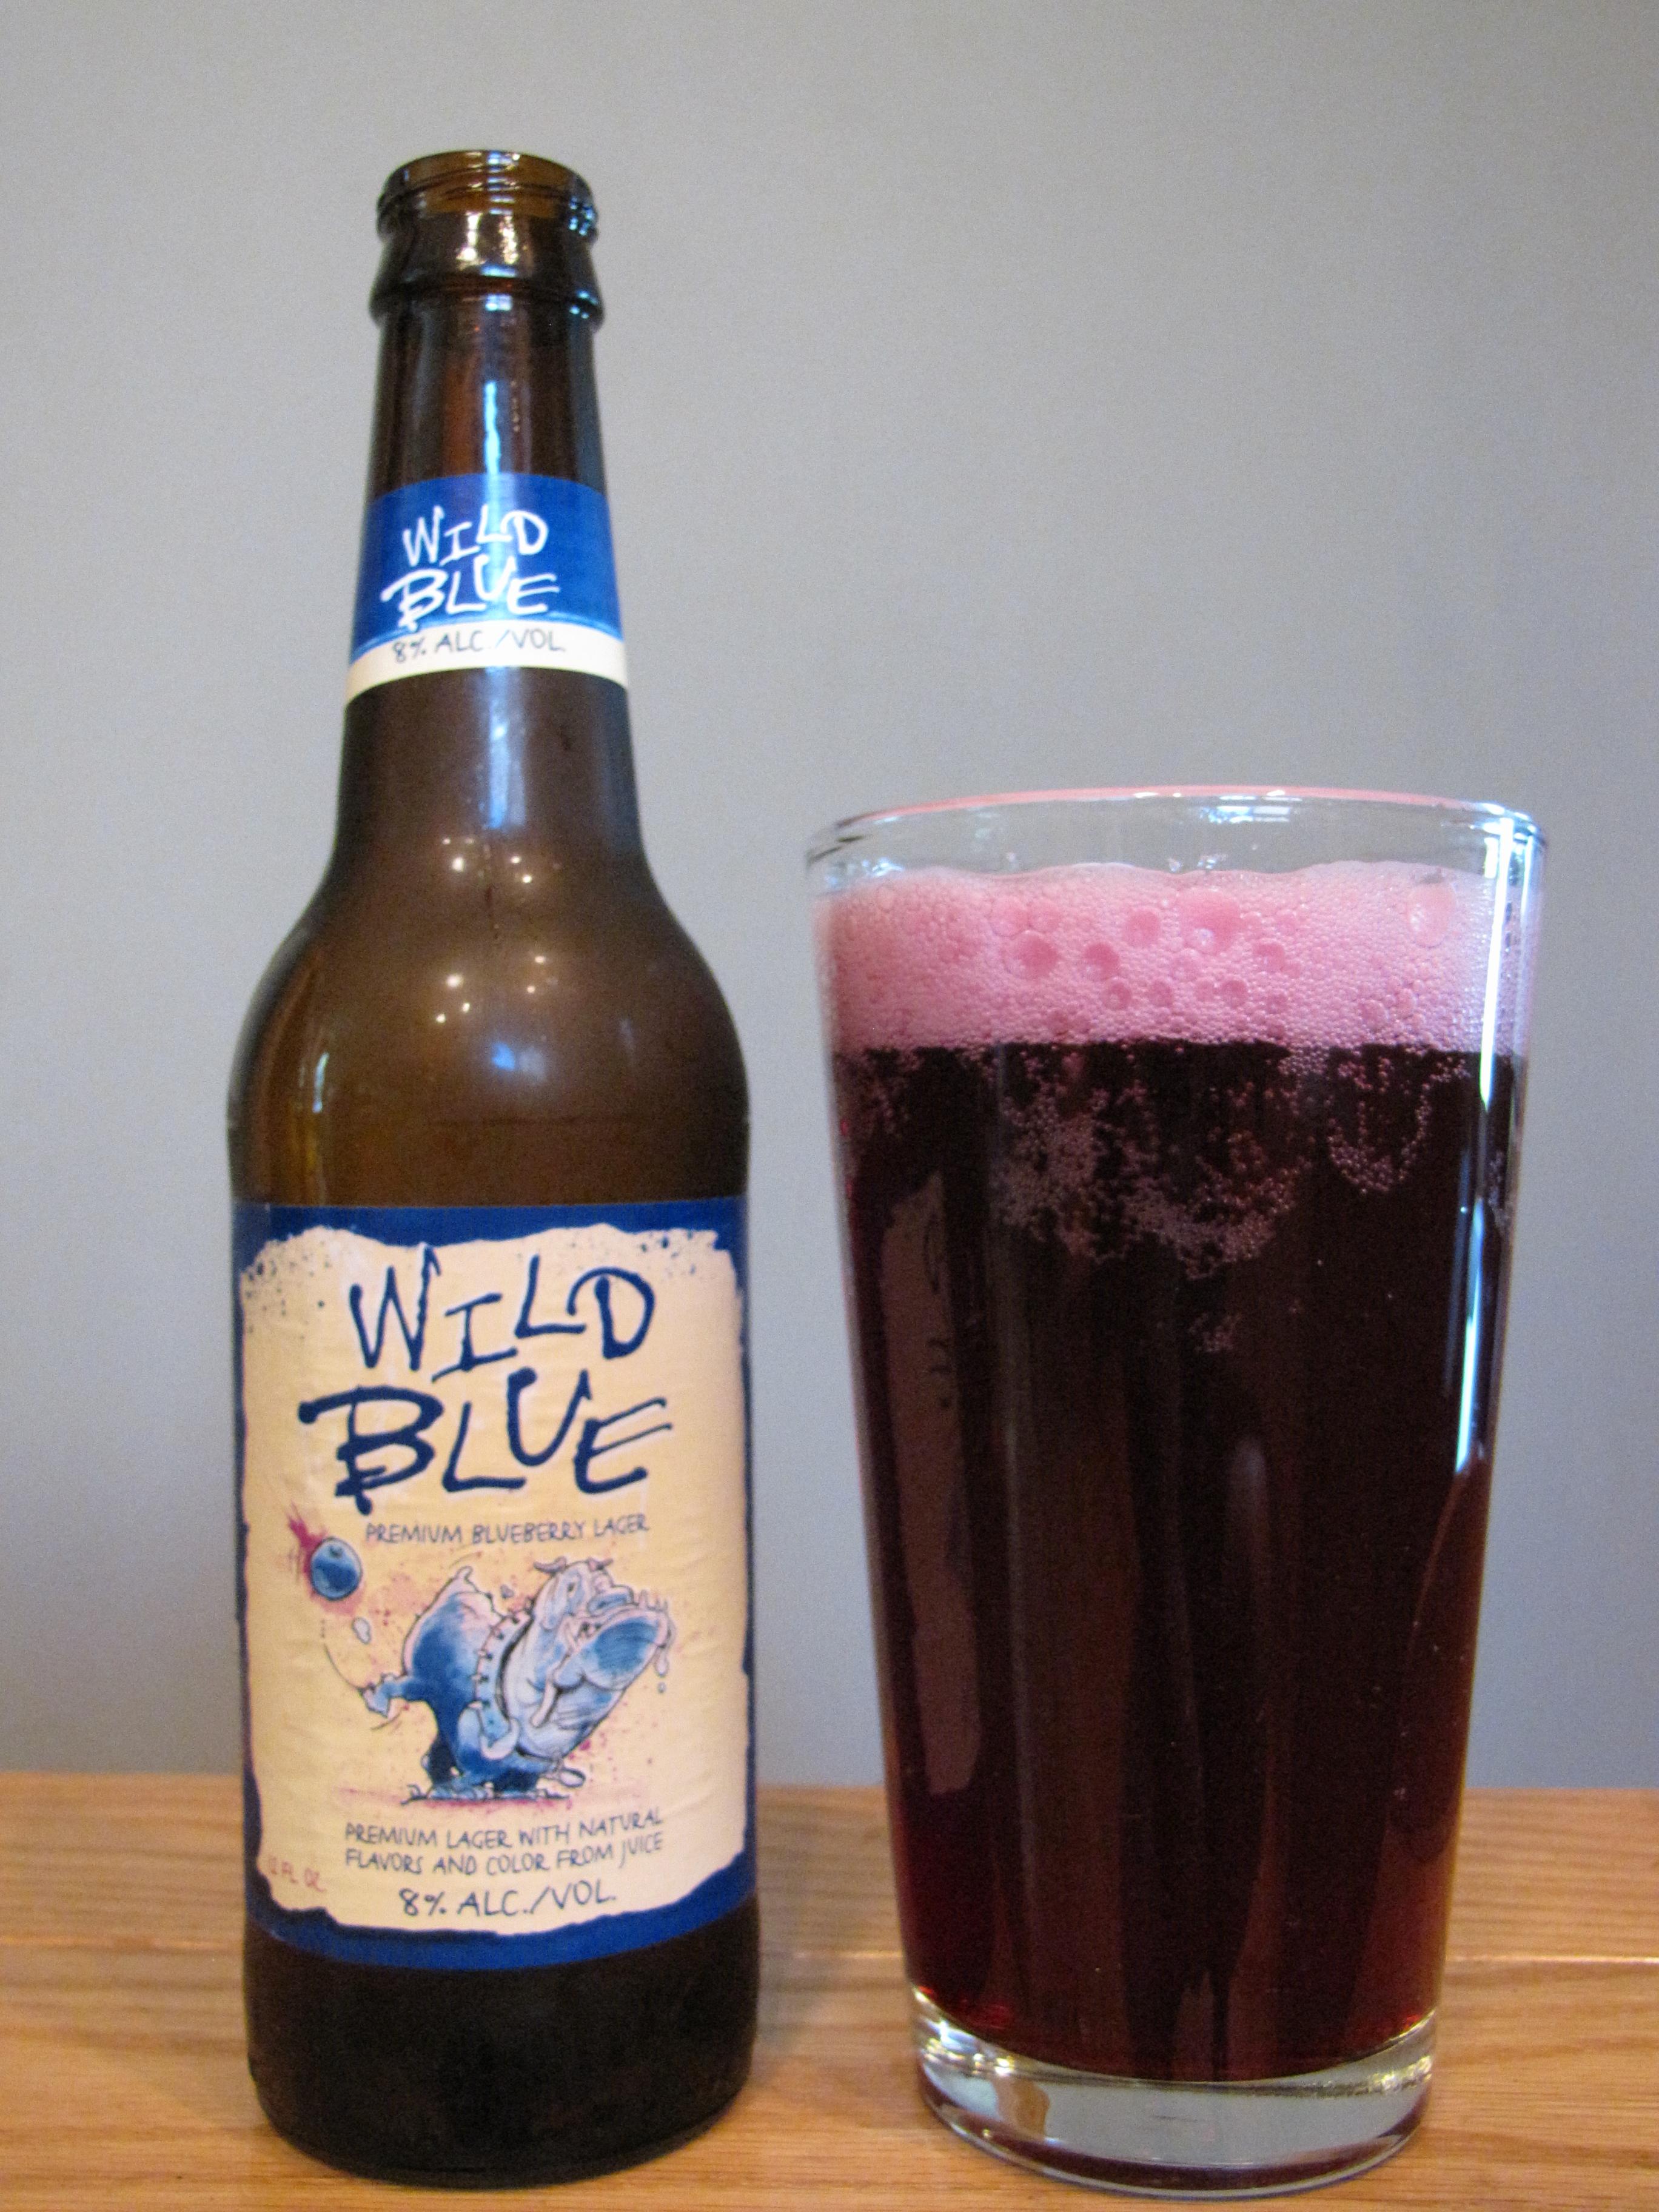 Anheuser-Busch Wild Blue Blueberry Lager